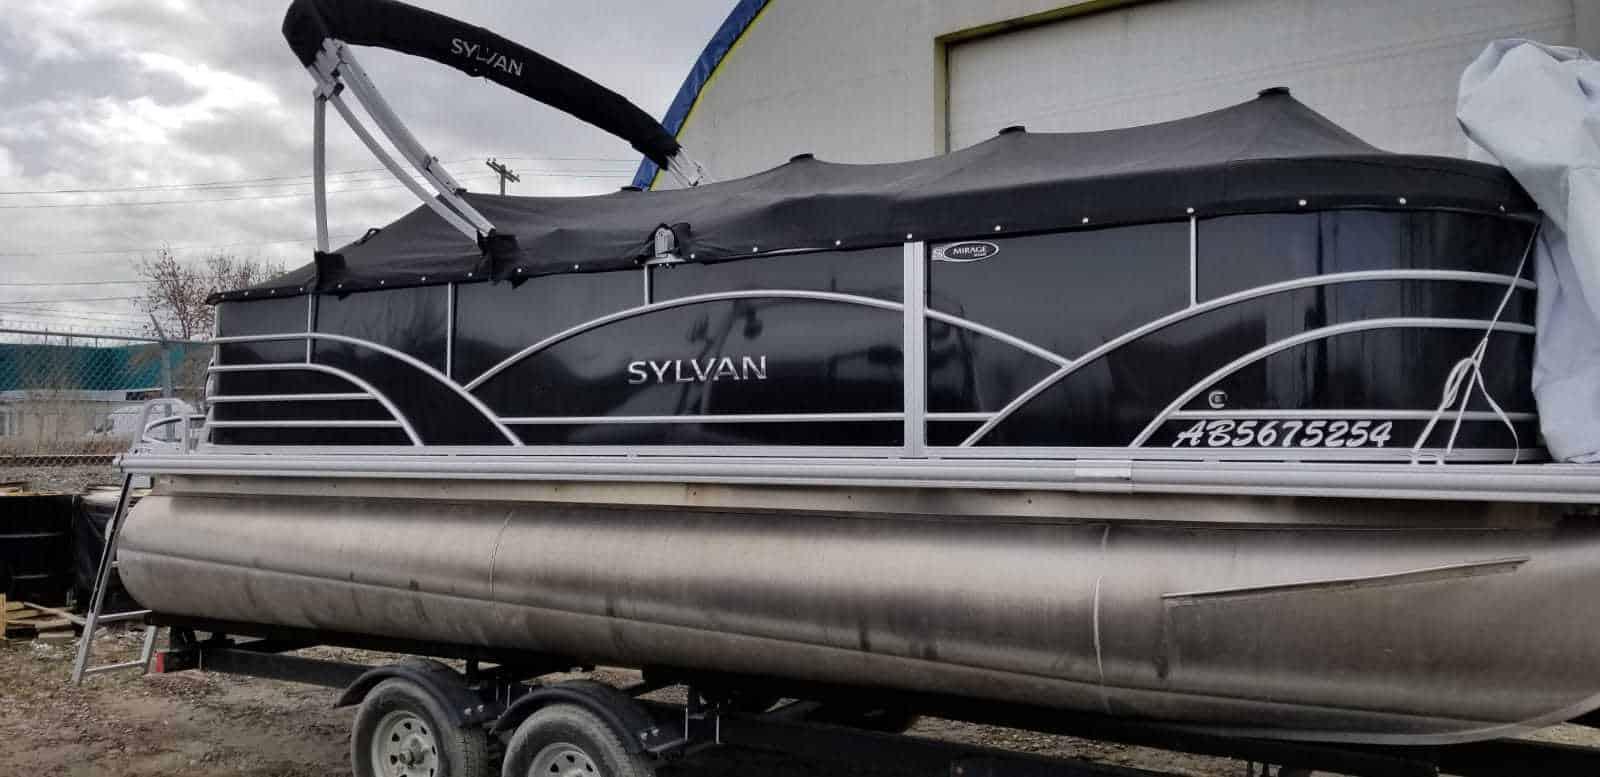 USED 2017 Sylvan Mirage 8520 Cruise PTS Tri Toon - Shipwreck Marine